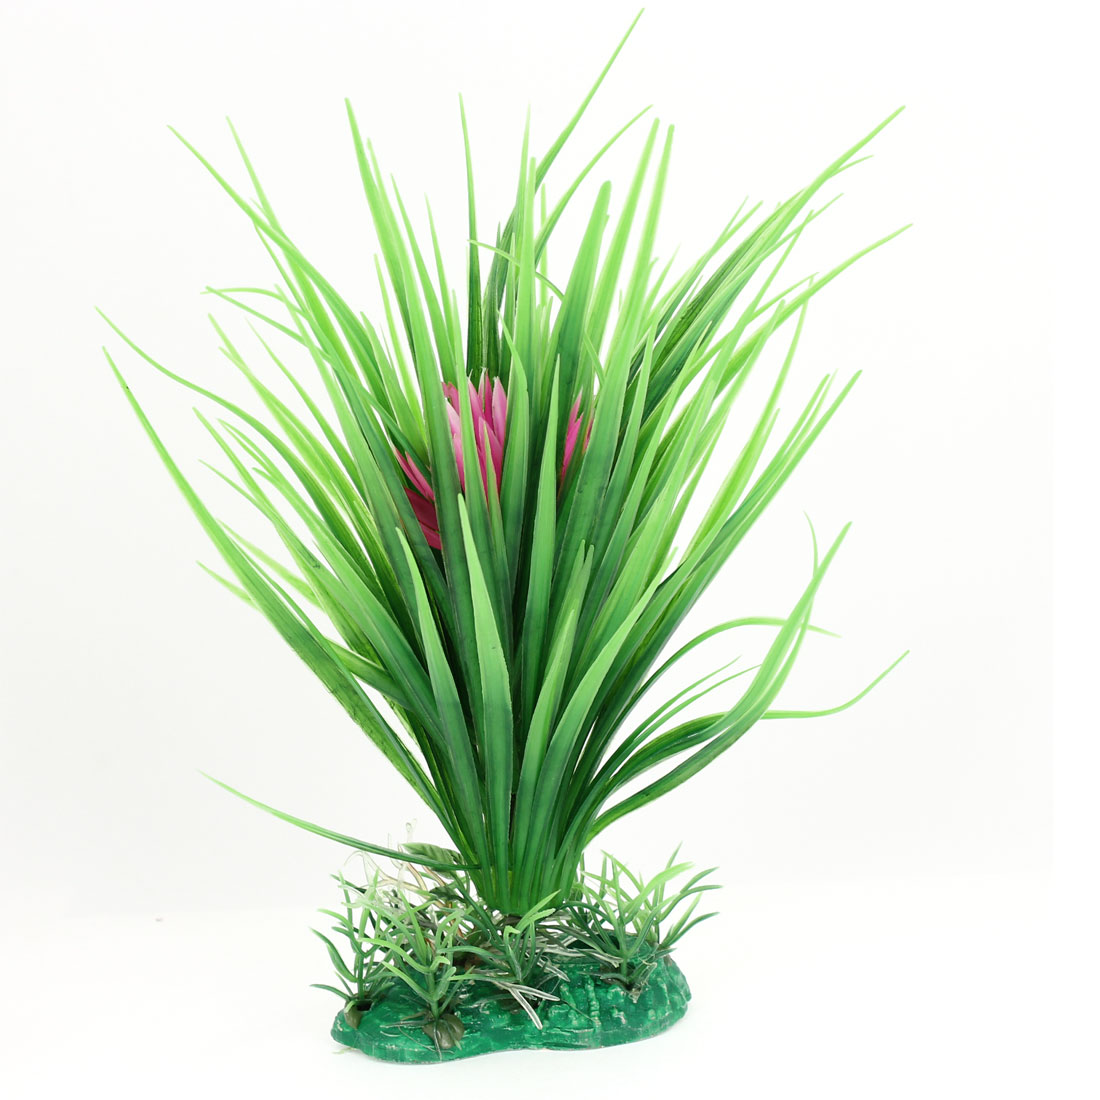 Ceramic Base 20cm High Emulational Green Grass Pink Flower Plant for Aquarium